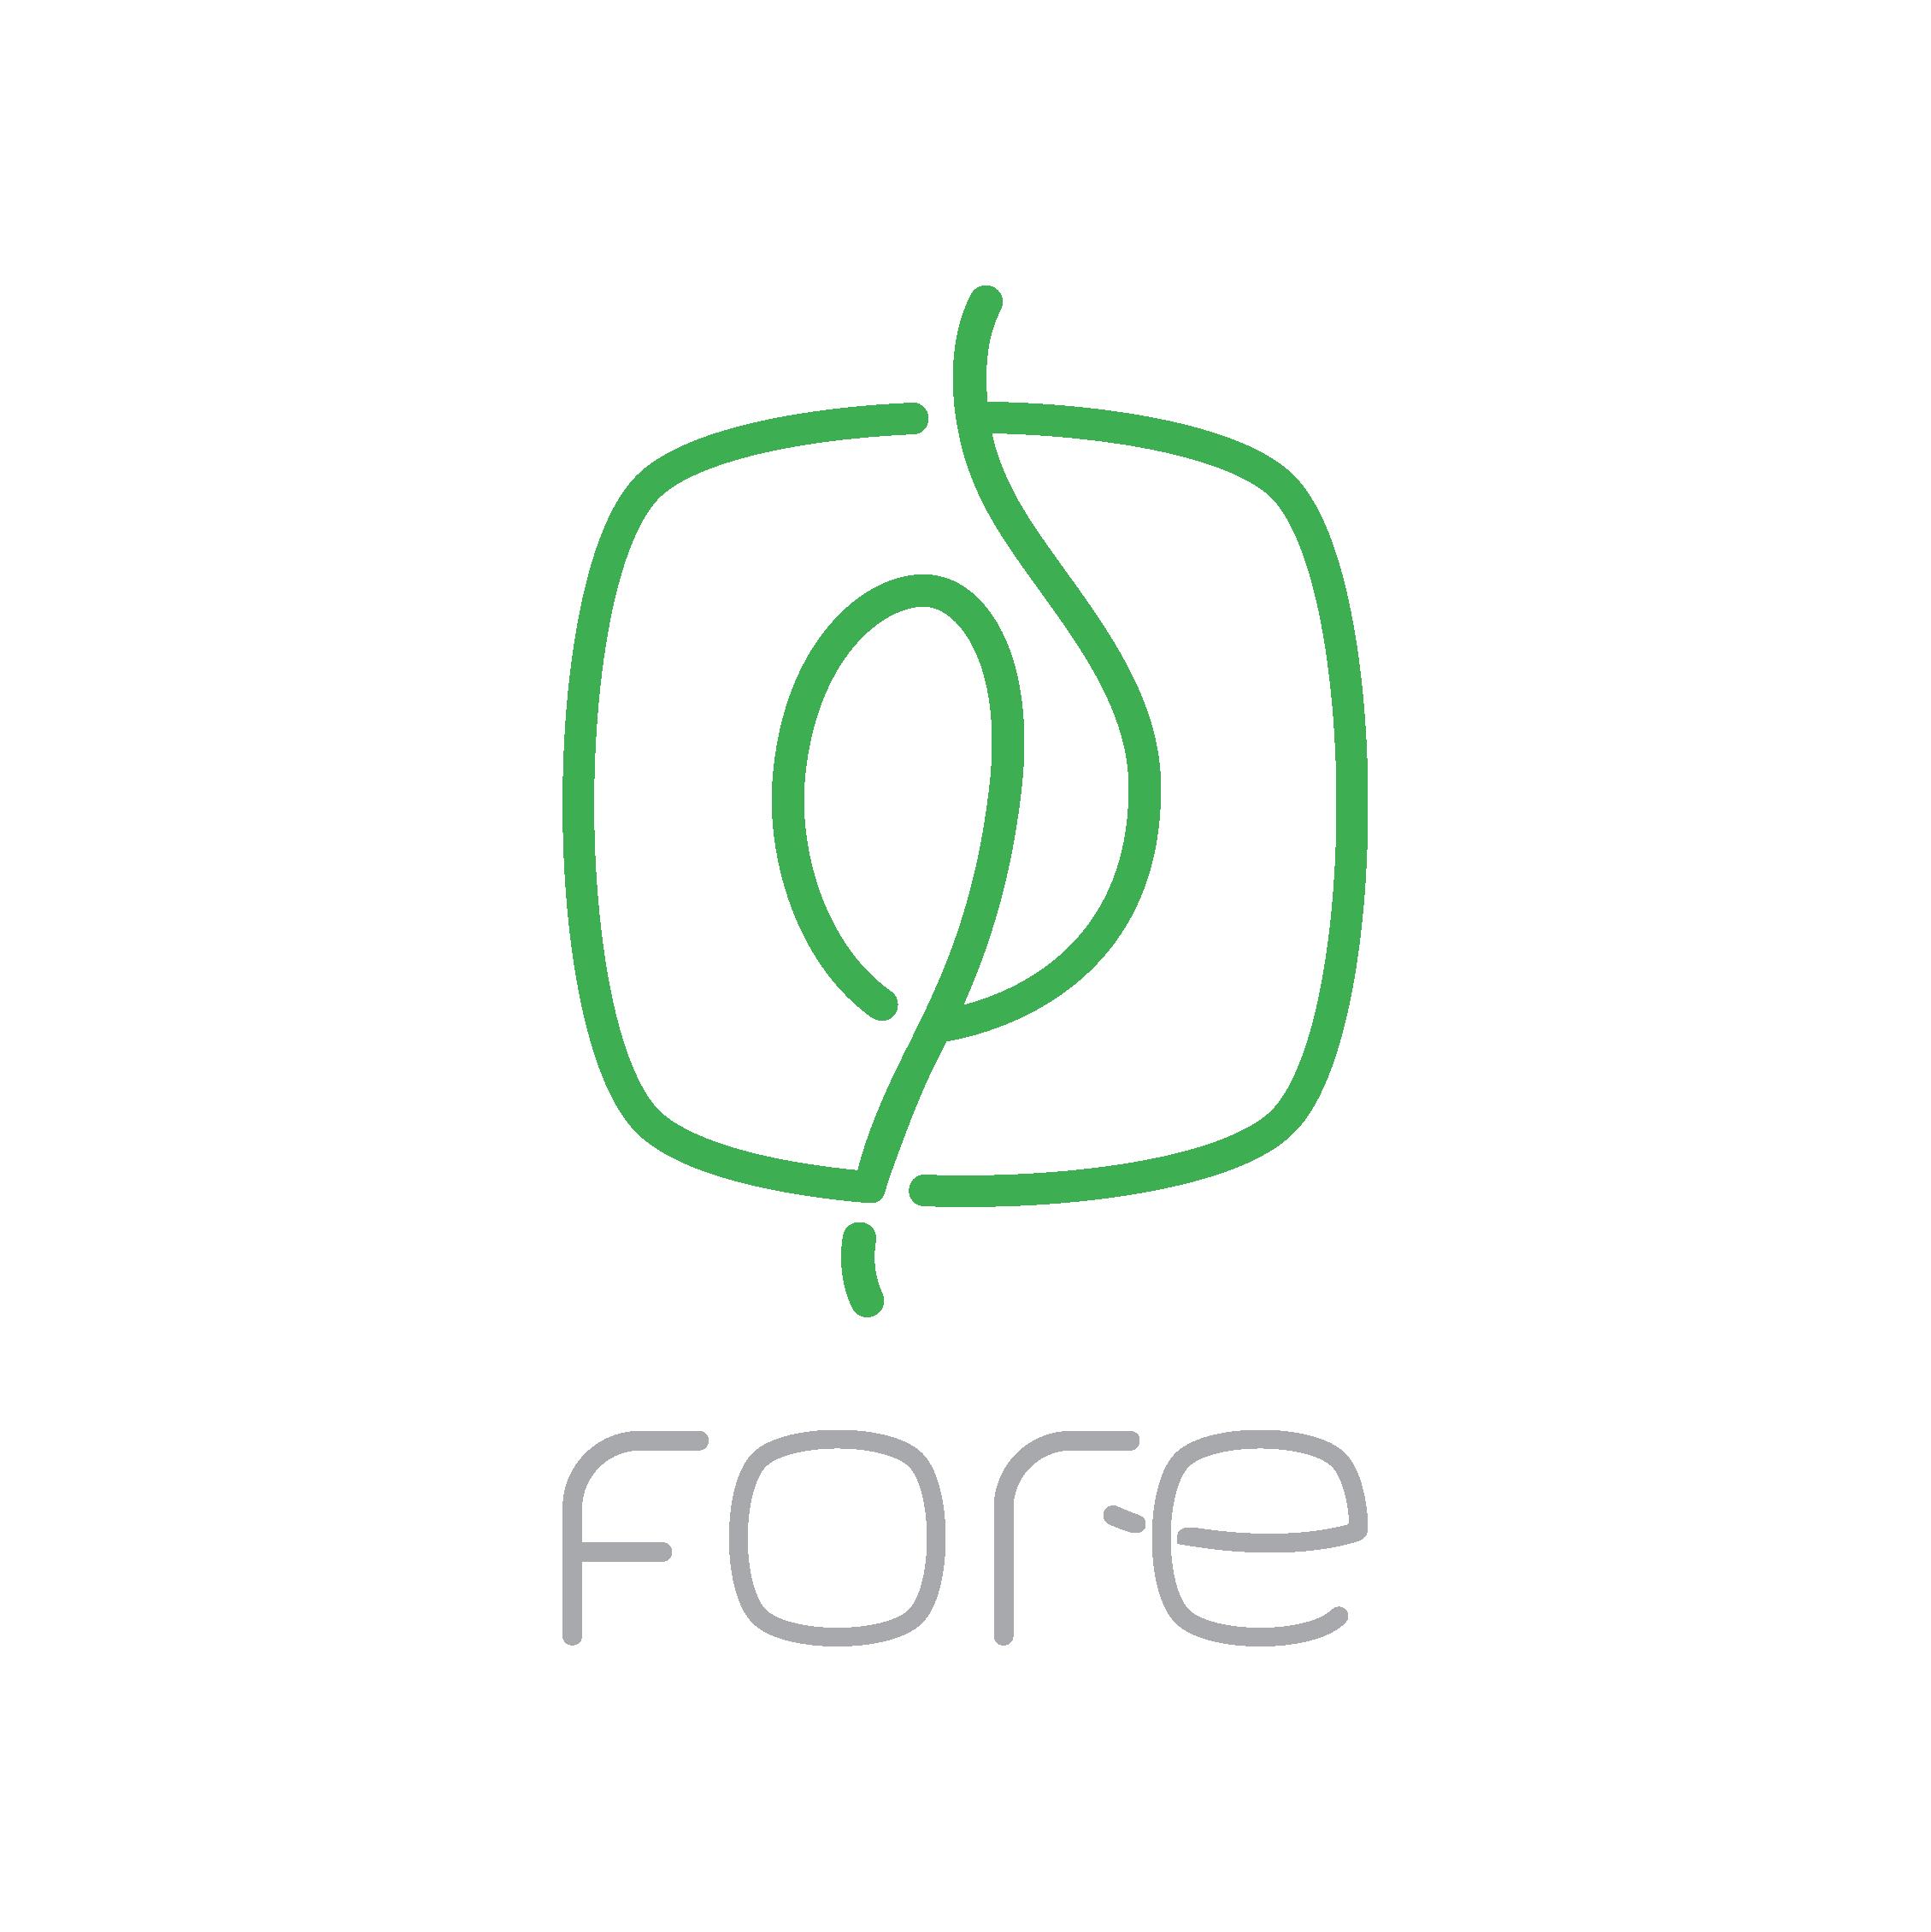 Fore Coffee company logo